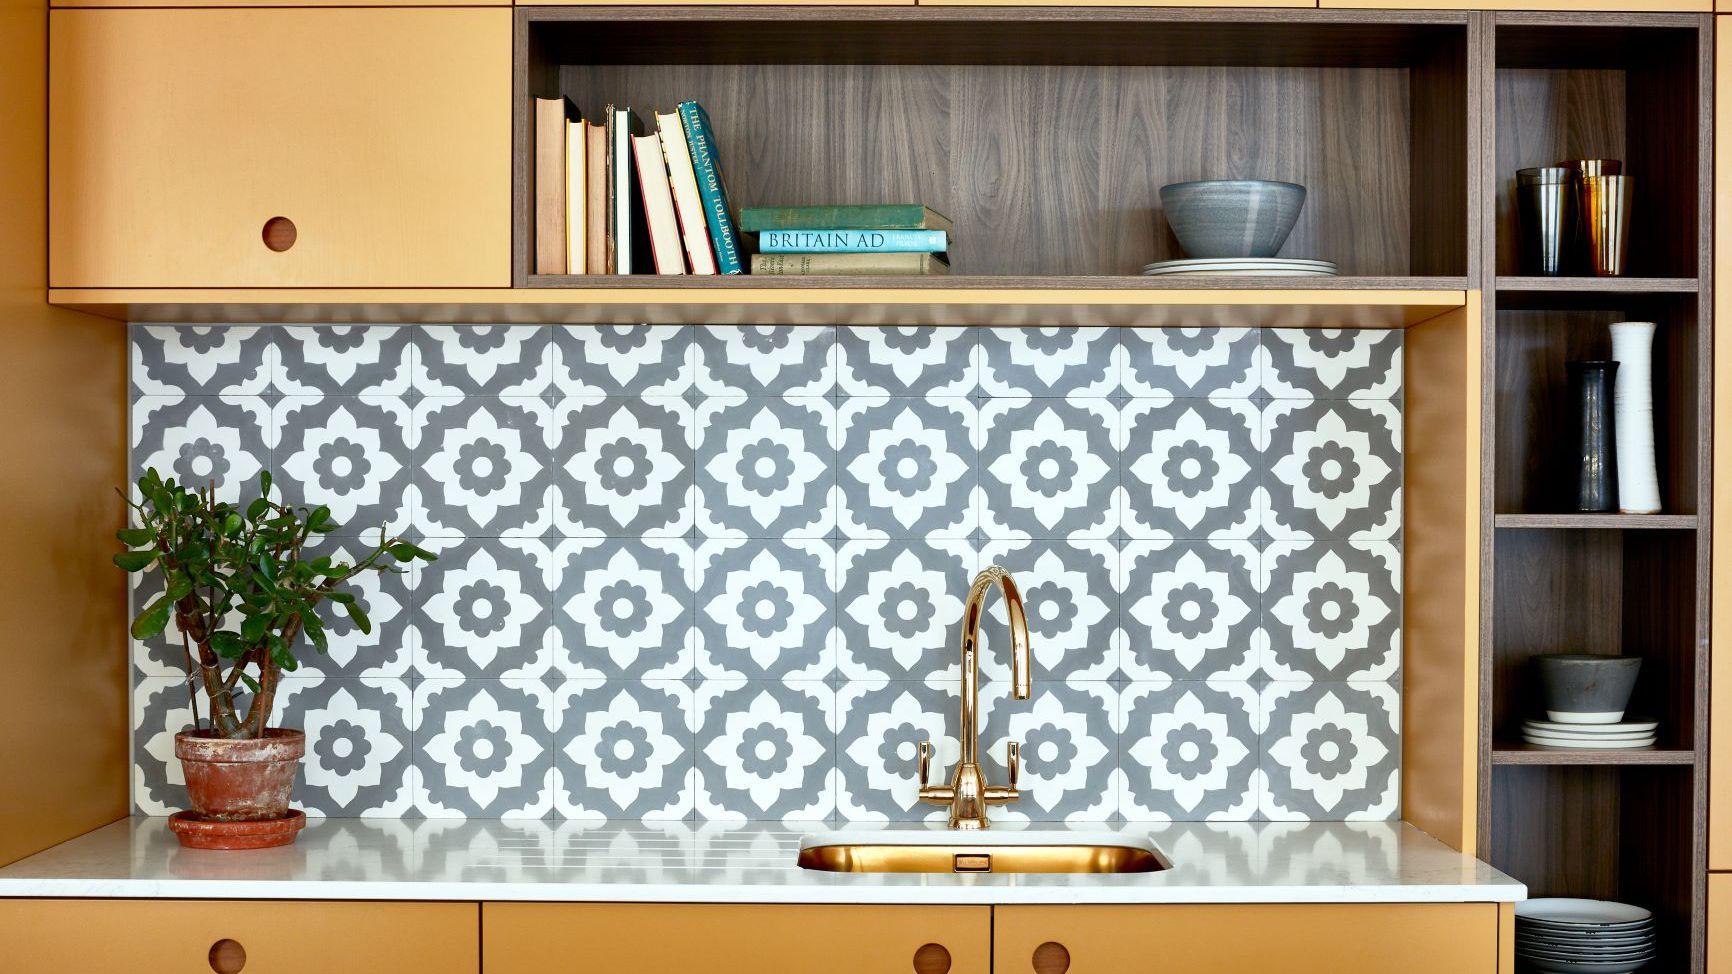 9 Gorgeous Wallpaper Backsplash Ideas to Try Now